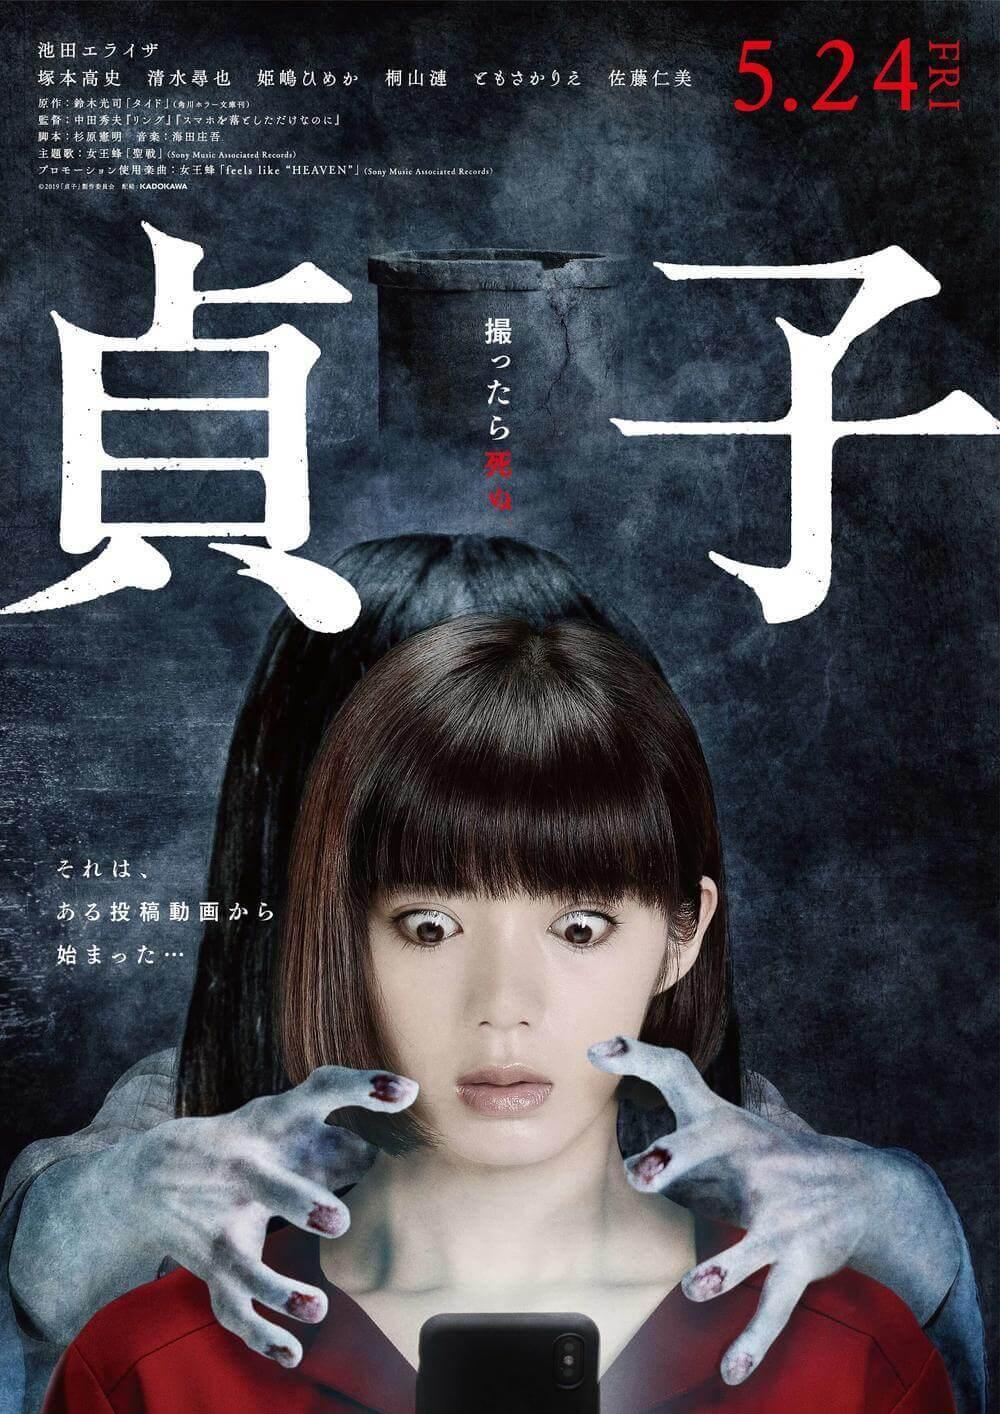 8. Sadako